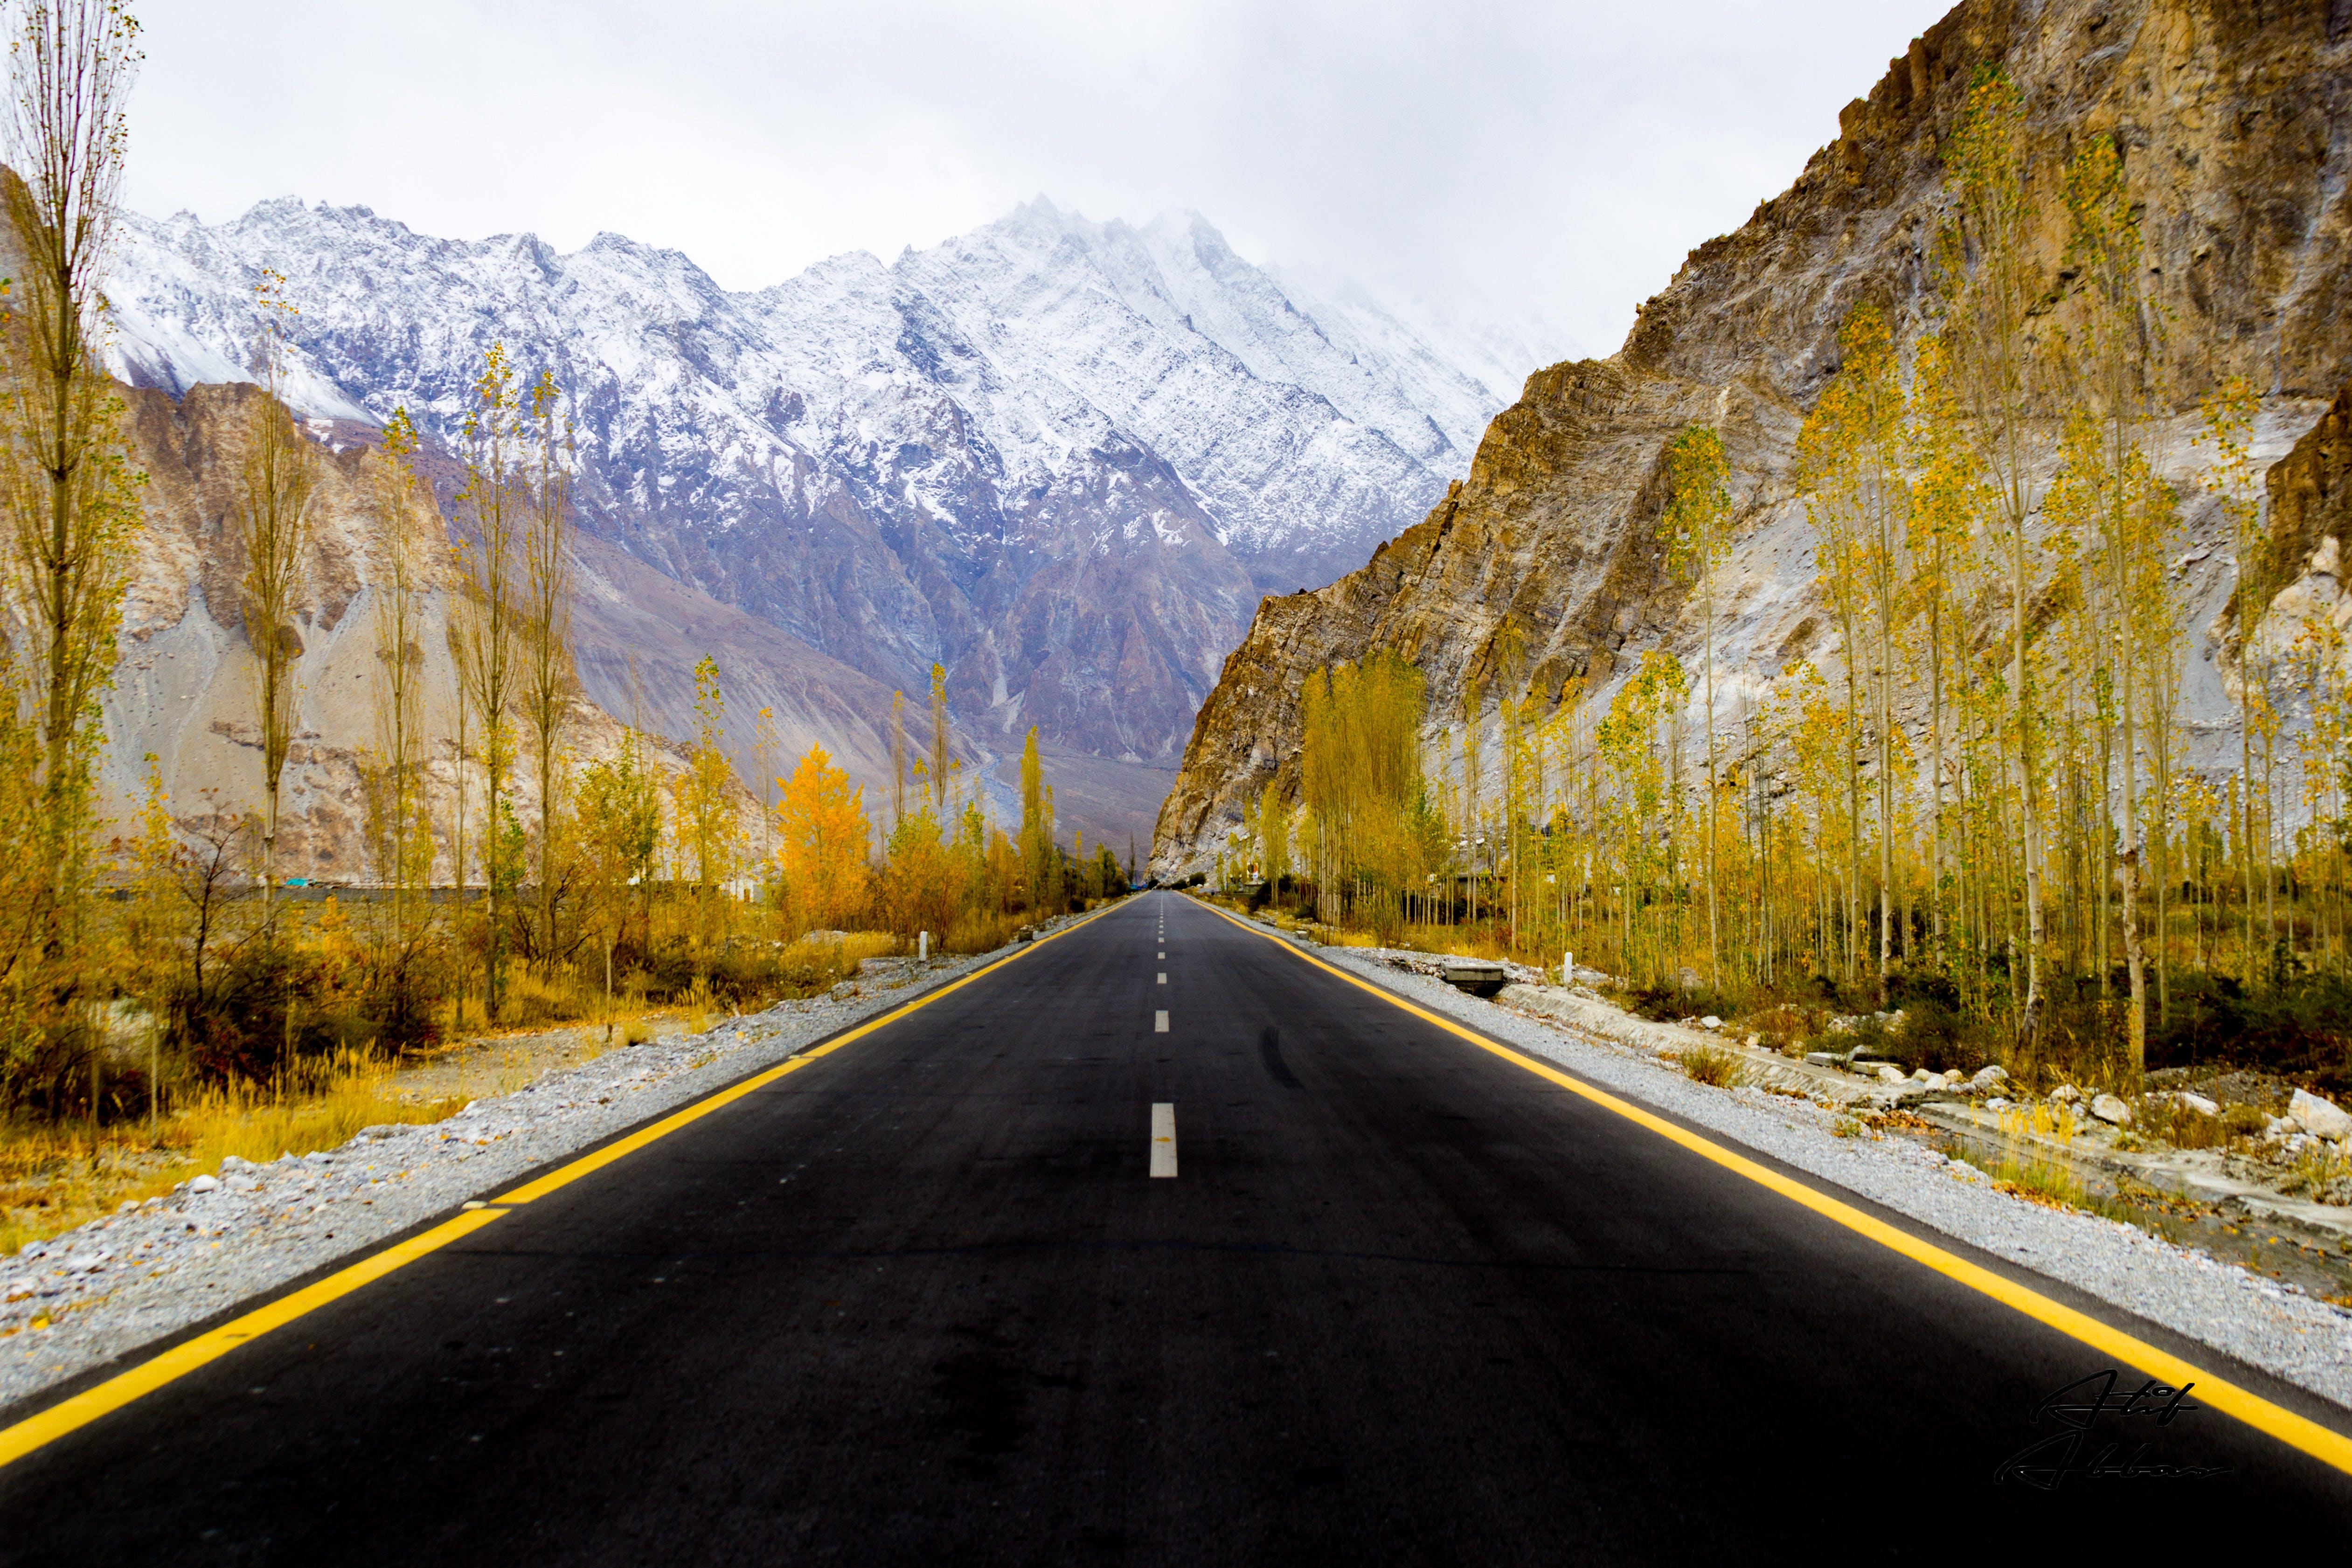 Asphalt Road Between Rock Mountains